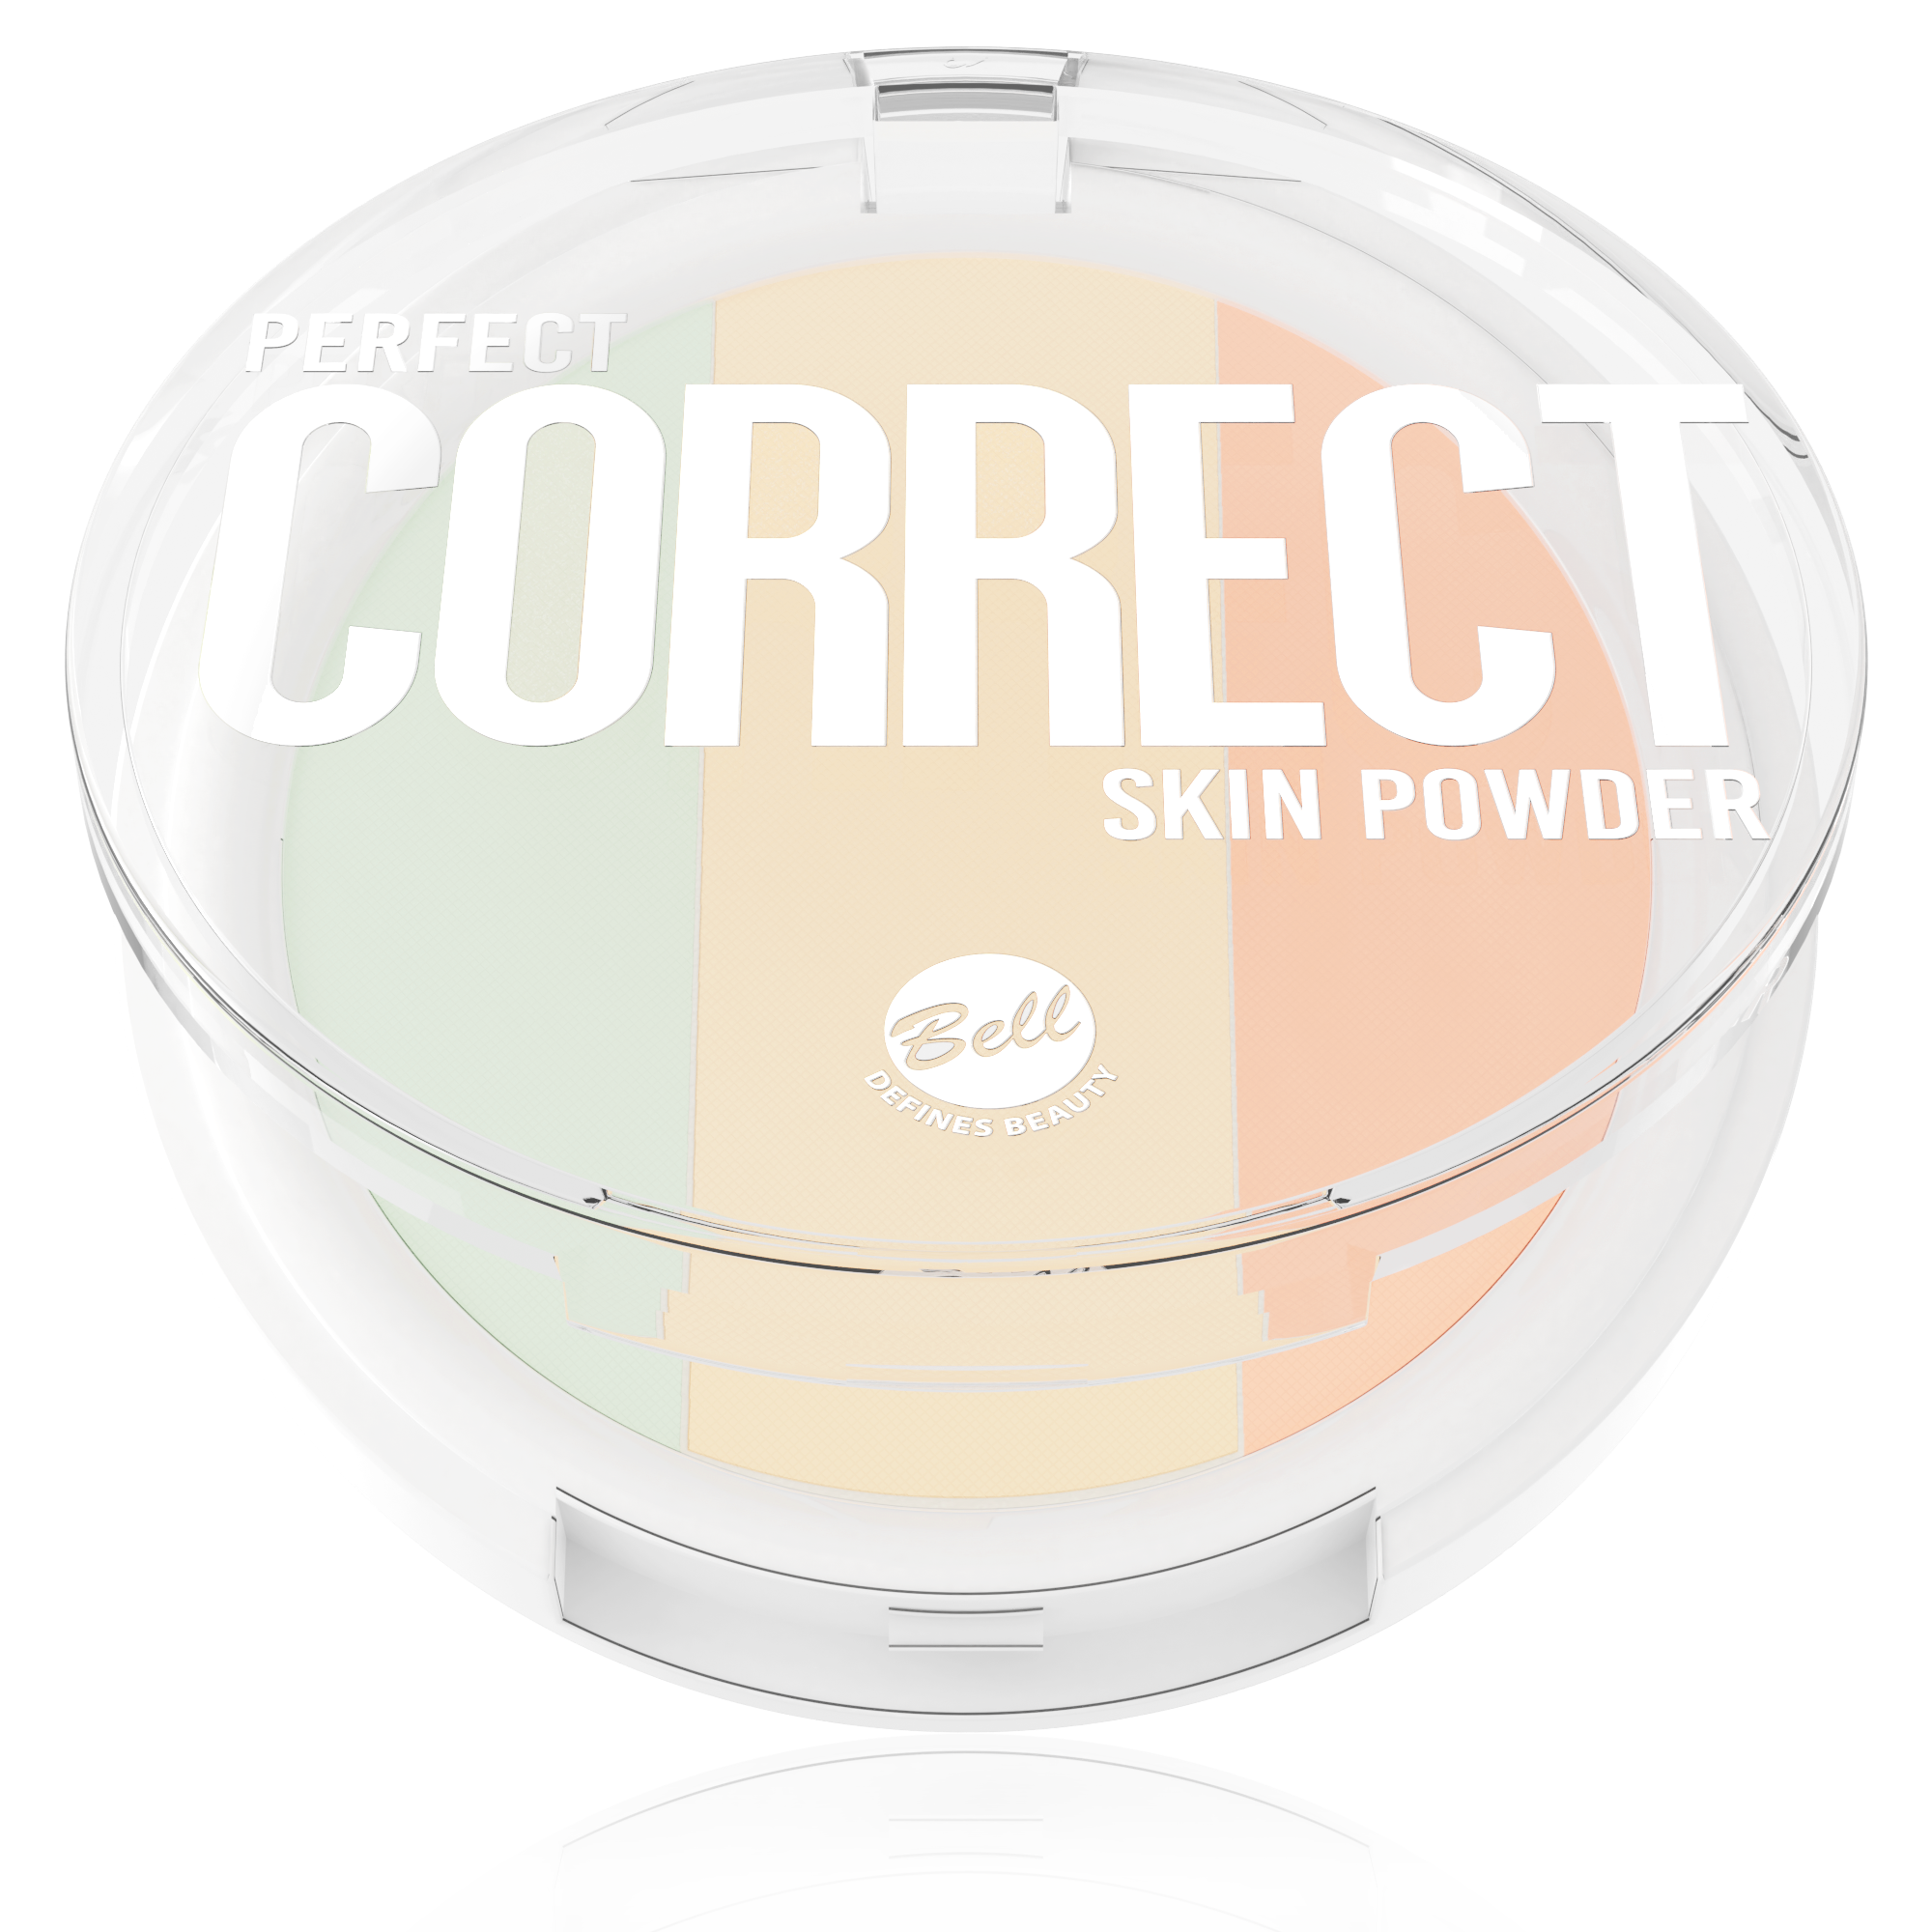 Perfect Correct Skin Powder